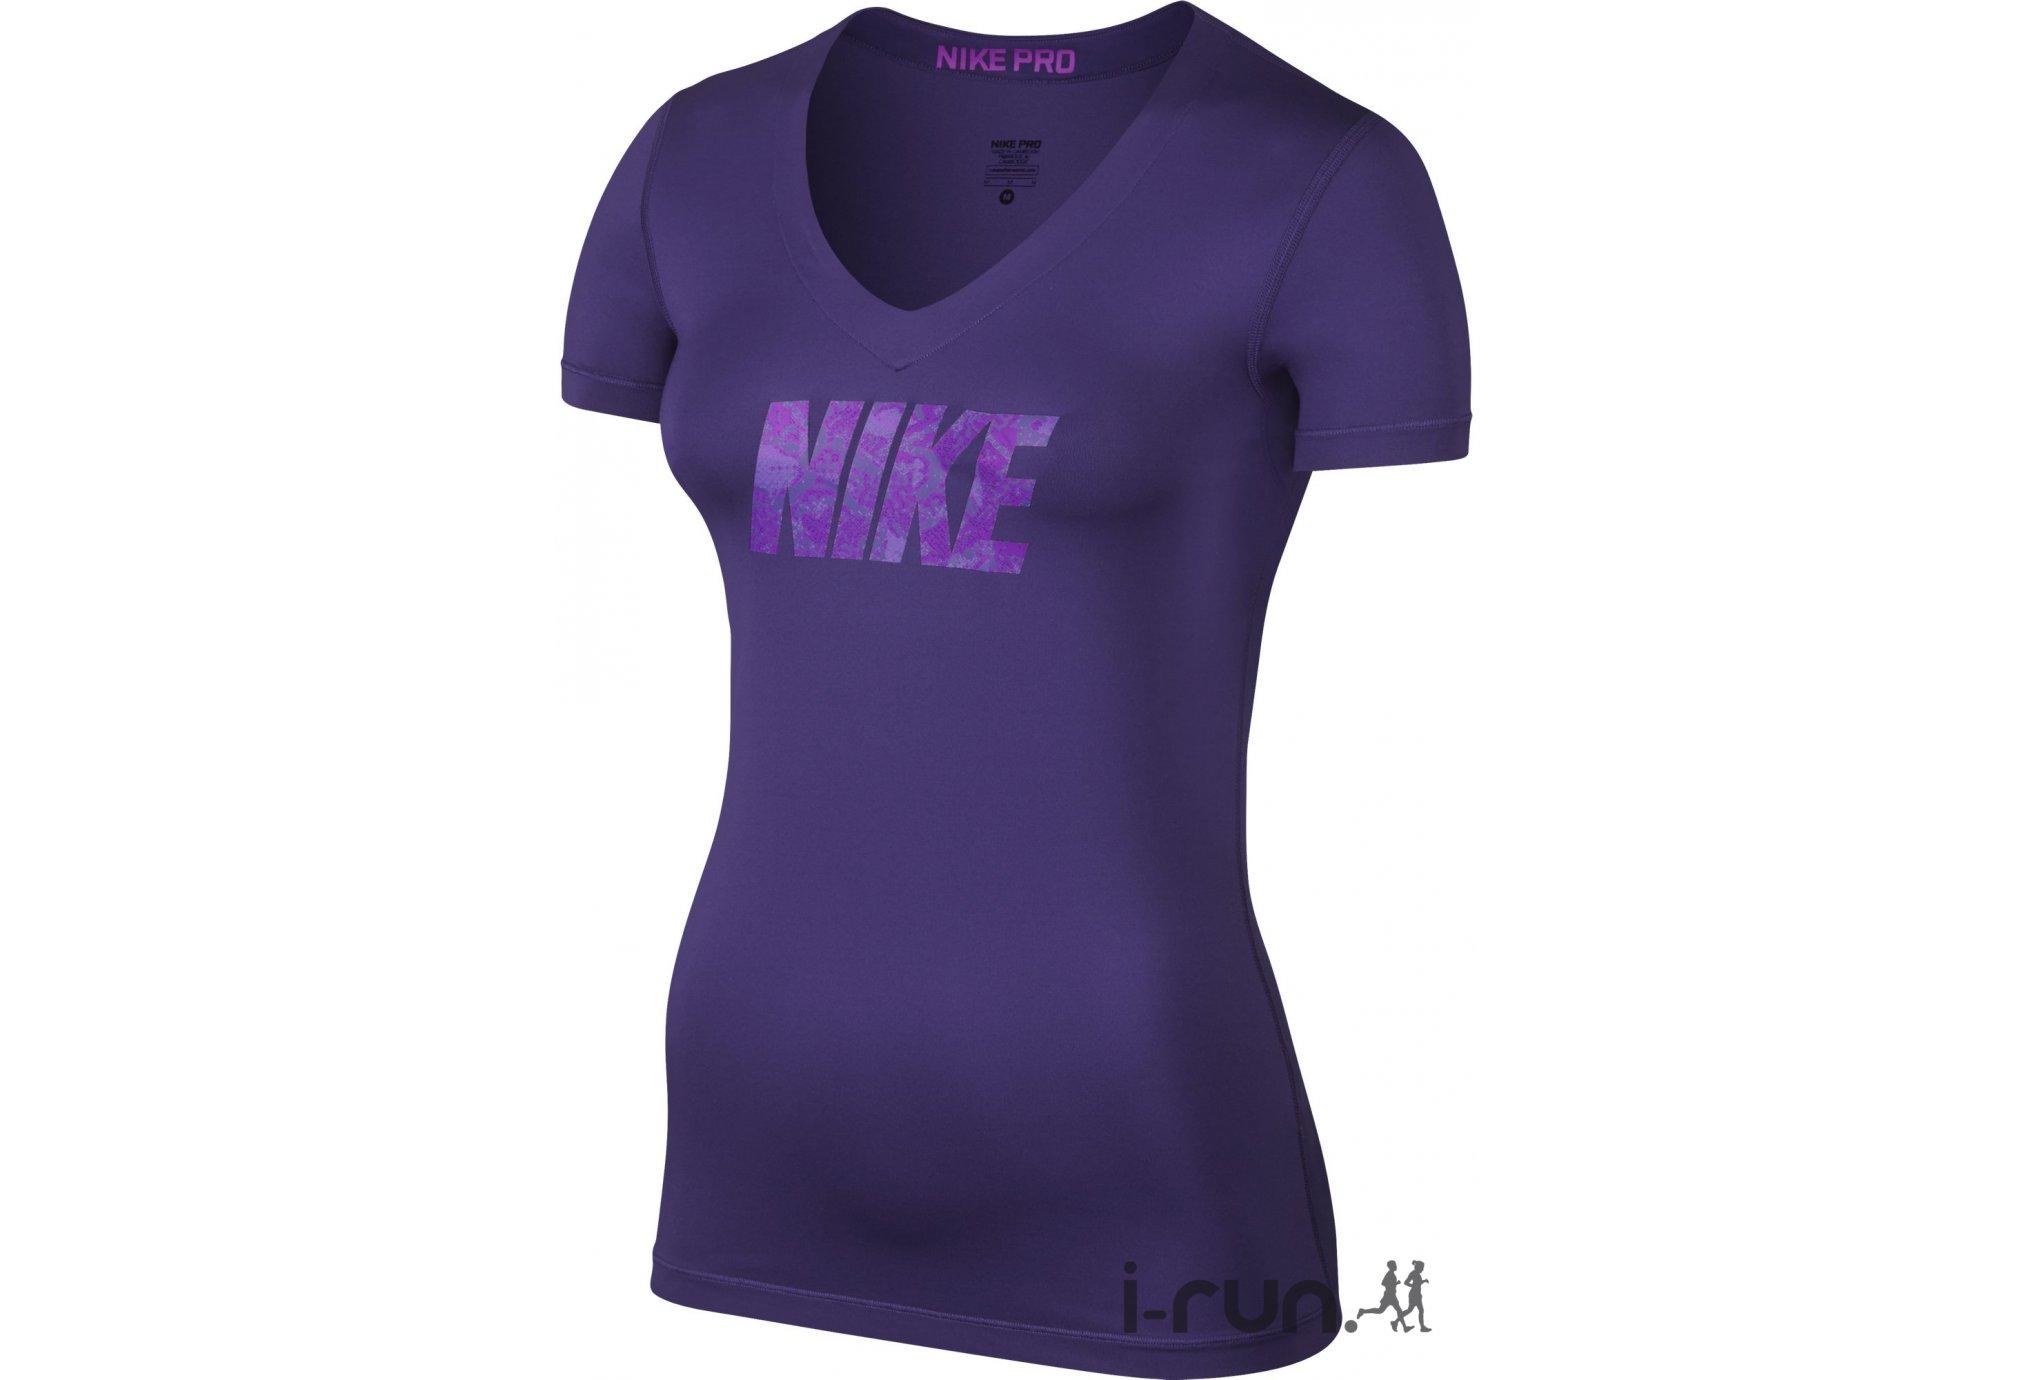 Nike pro tee shirt logo w pas cher destockage nike running pro tee shirt lo - Destockage fitness avis ...